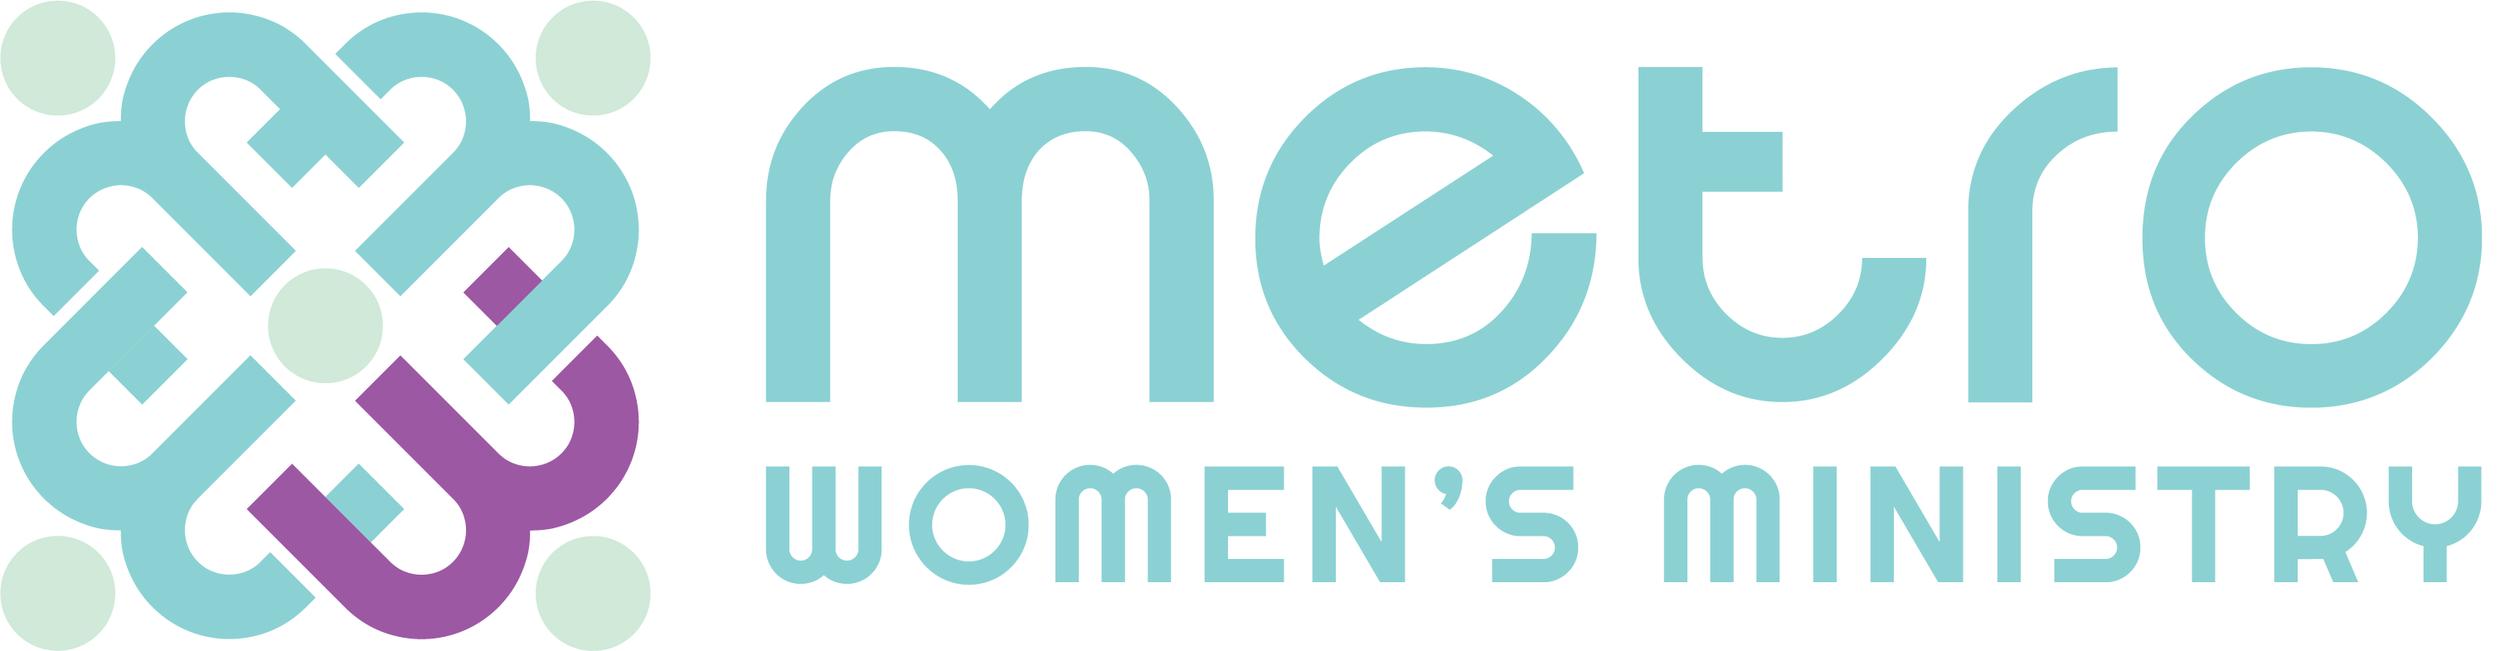 _LogoMetro_Womens_Horizontal.png